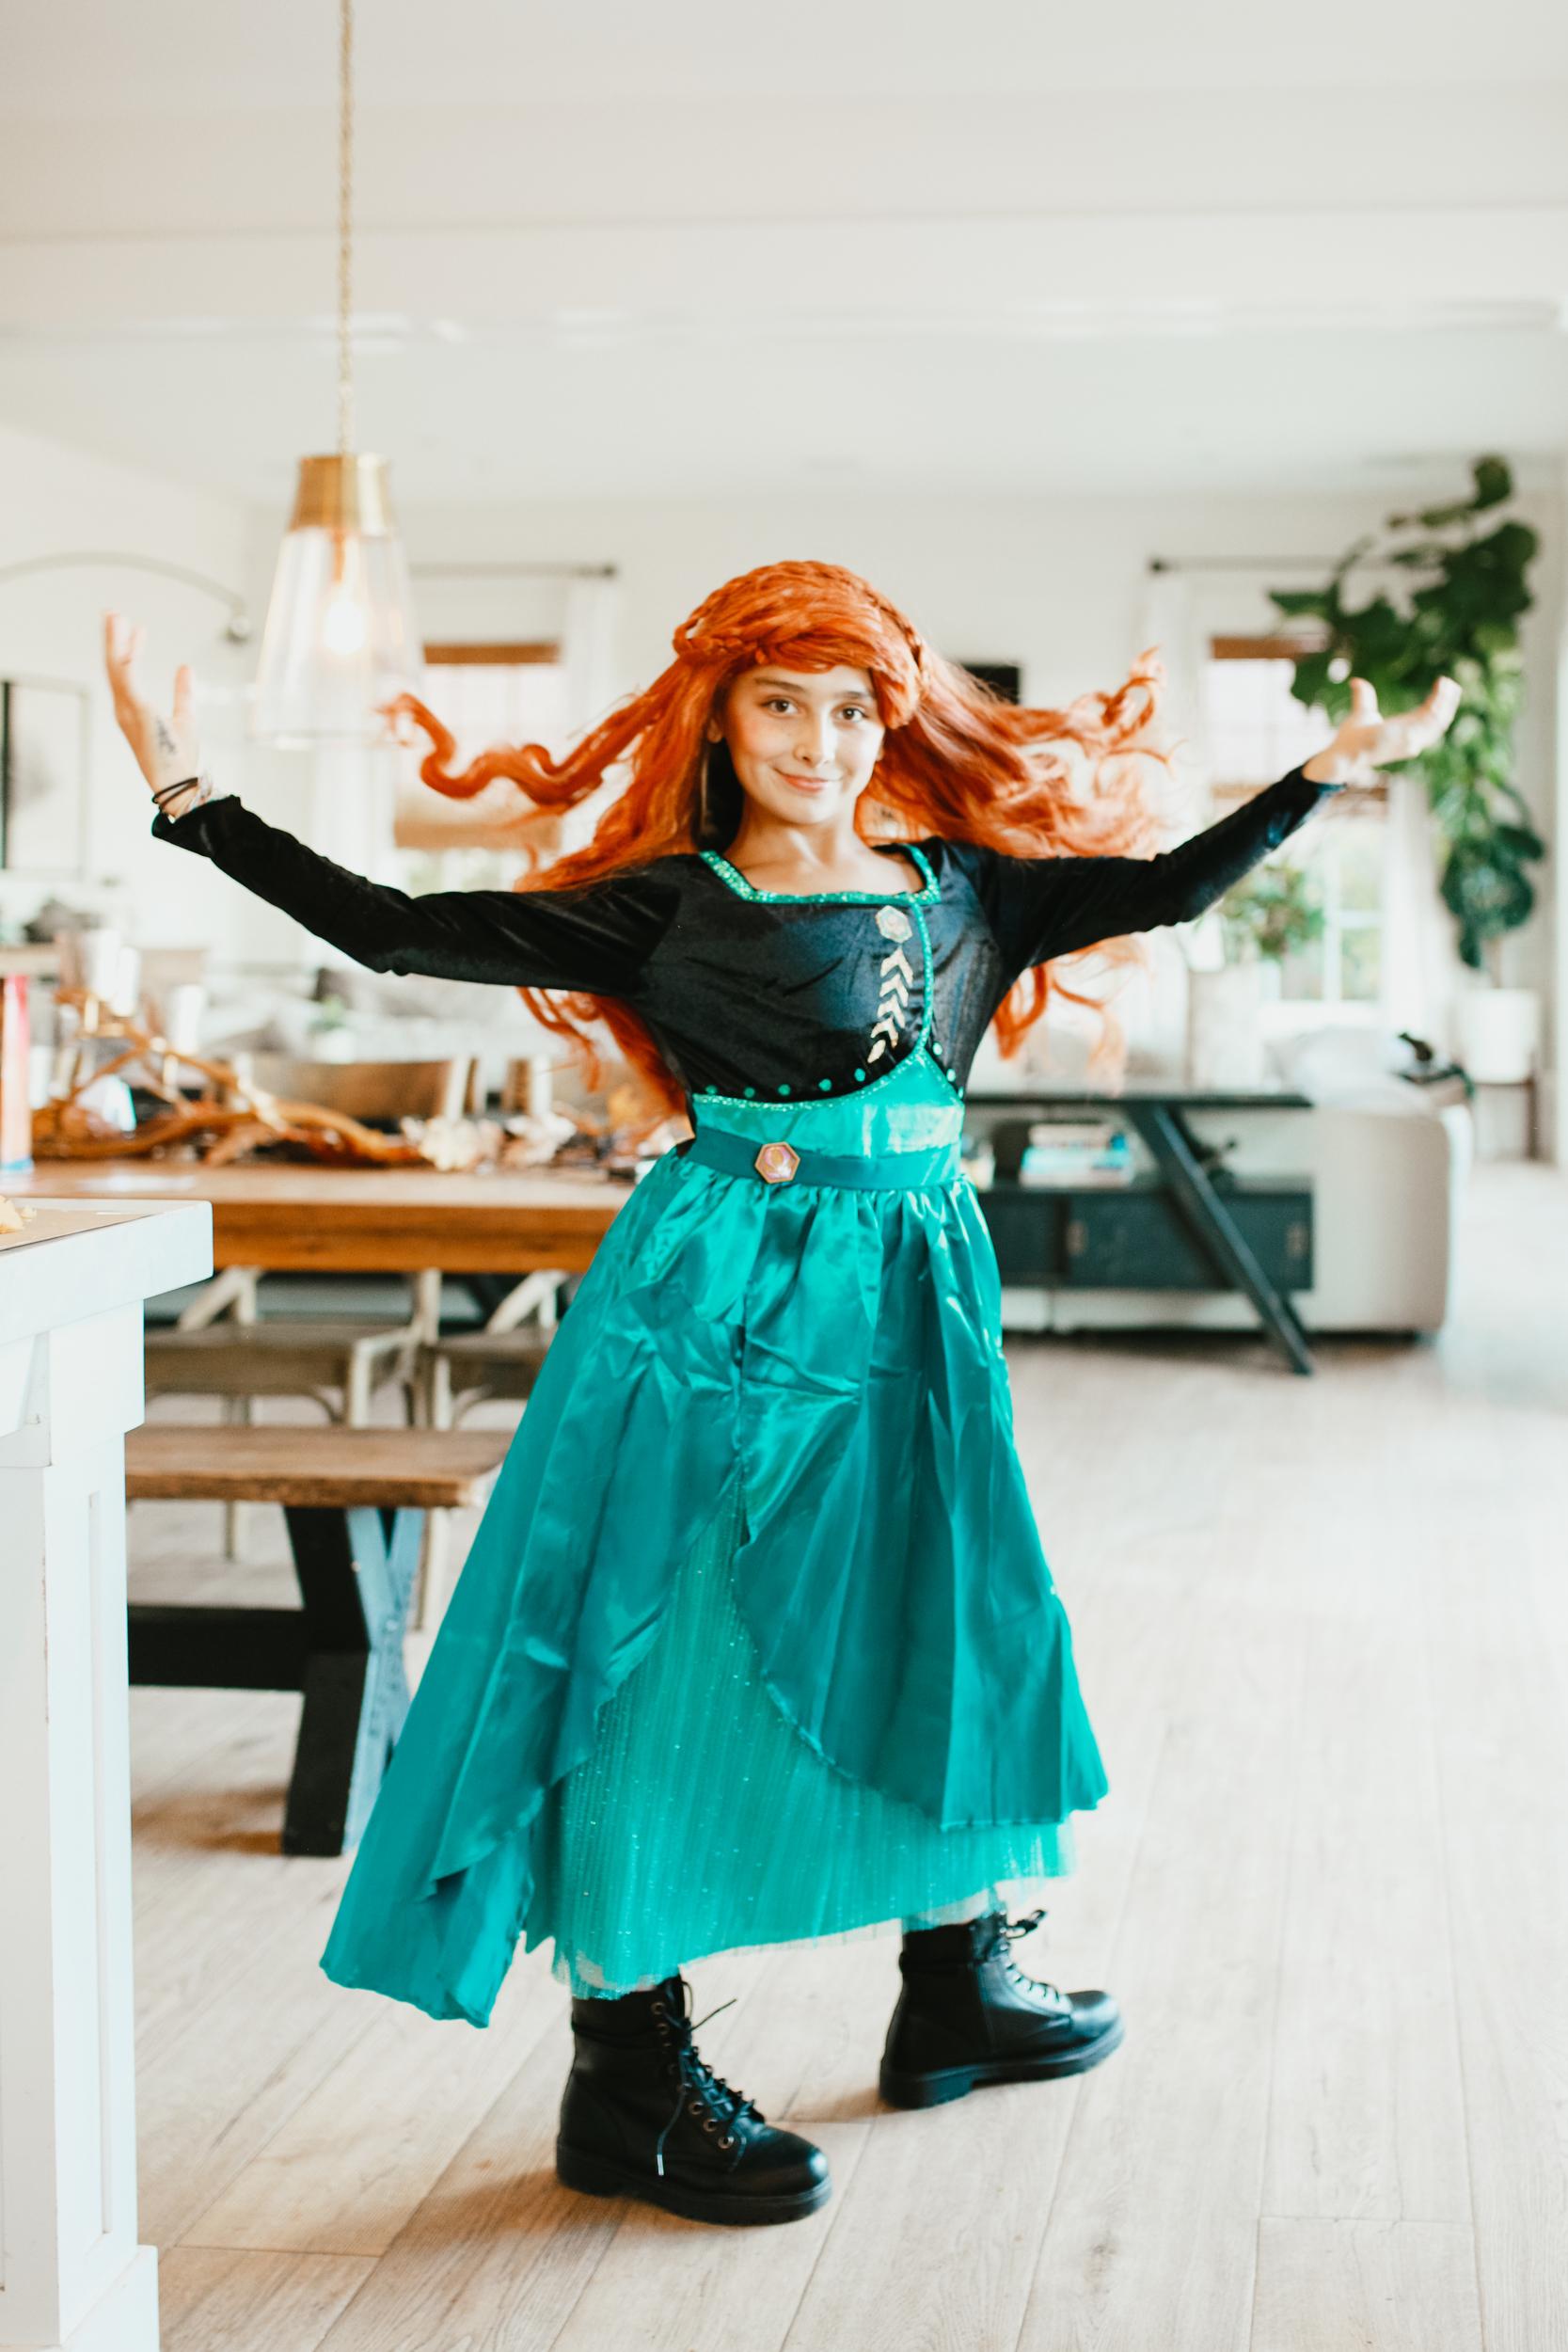 girl in disney princess costume